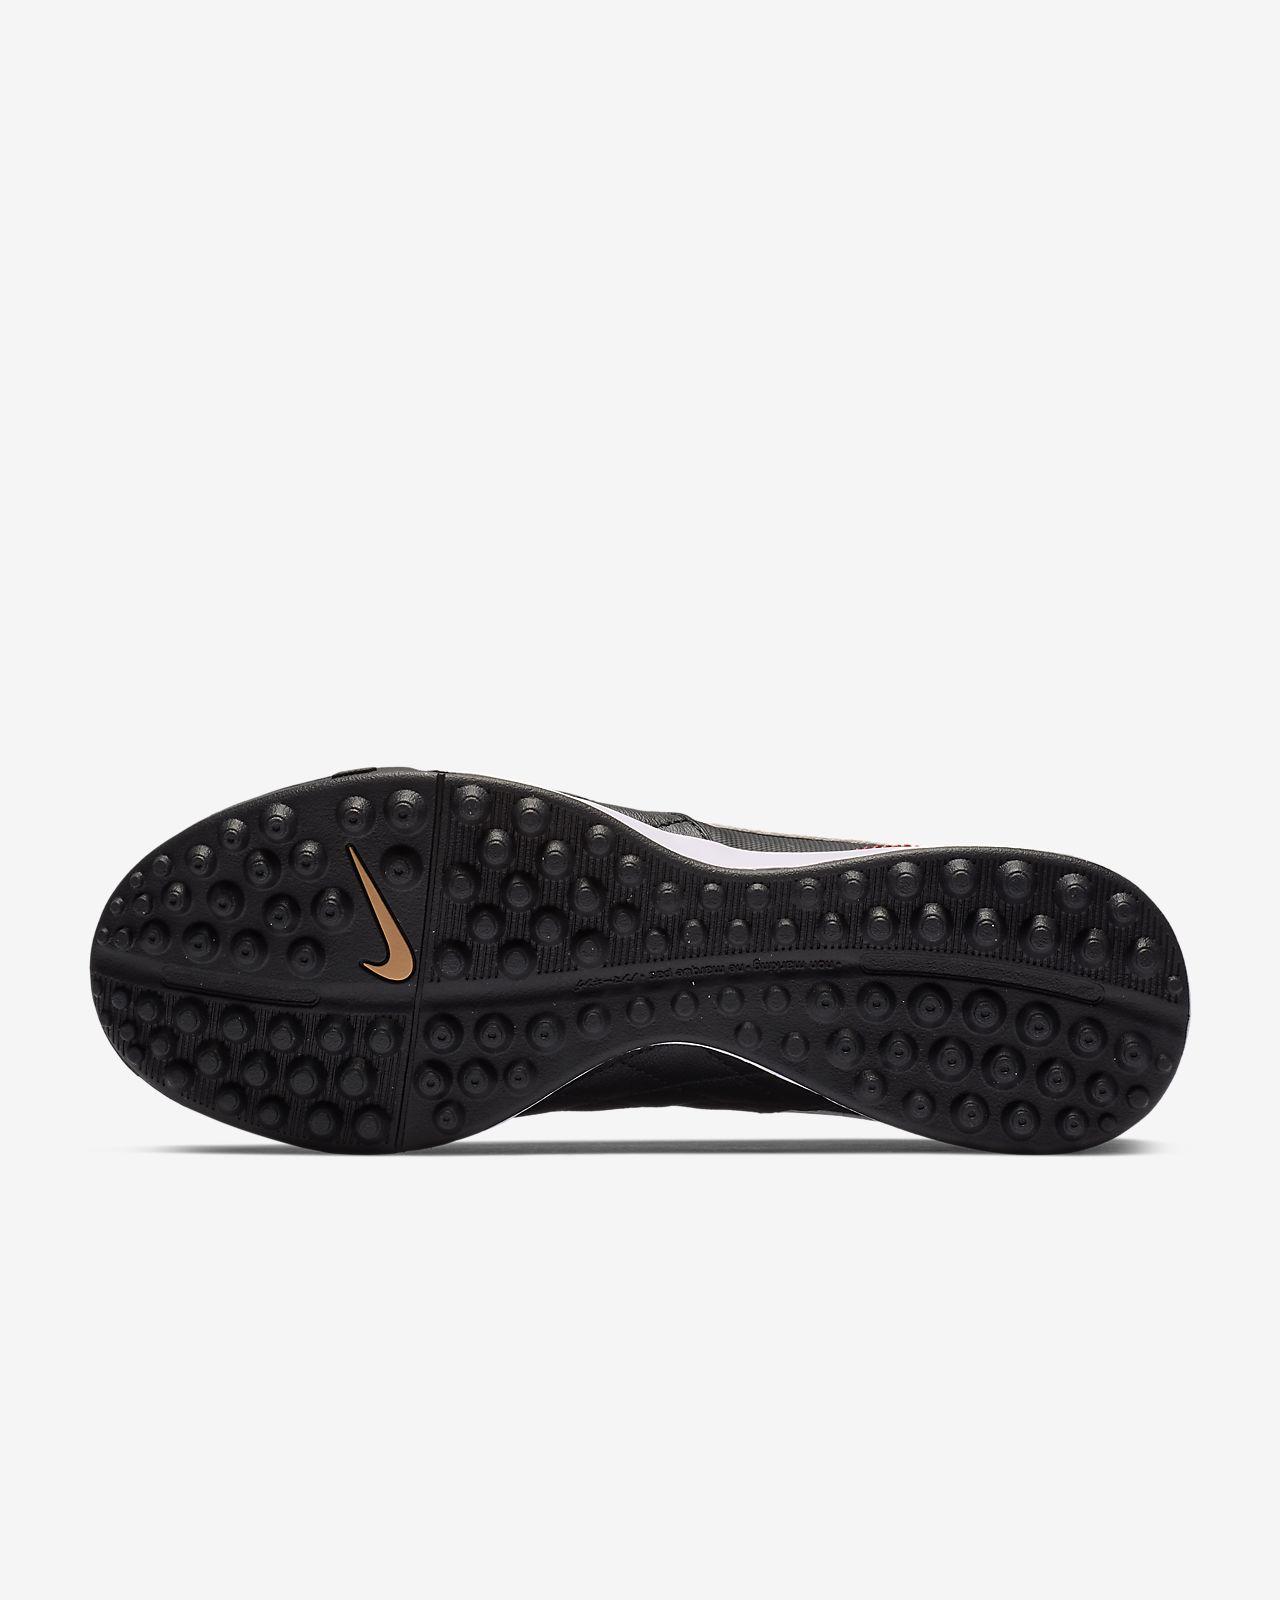 best sneakers 2e822 39854 ... Nike TiempoX Legend VII Academy 10R Turf Football Shoe